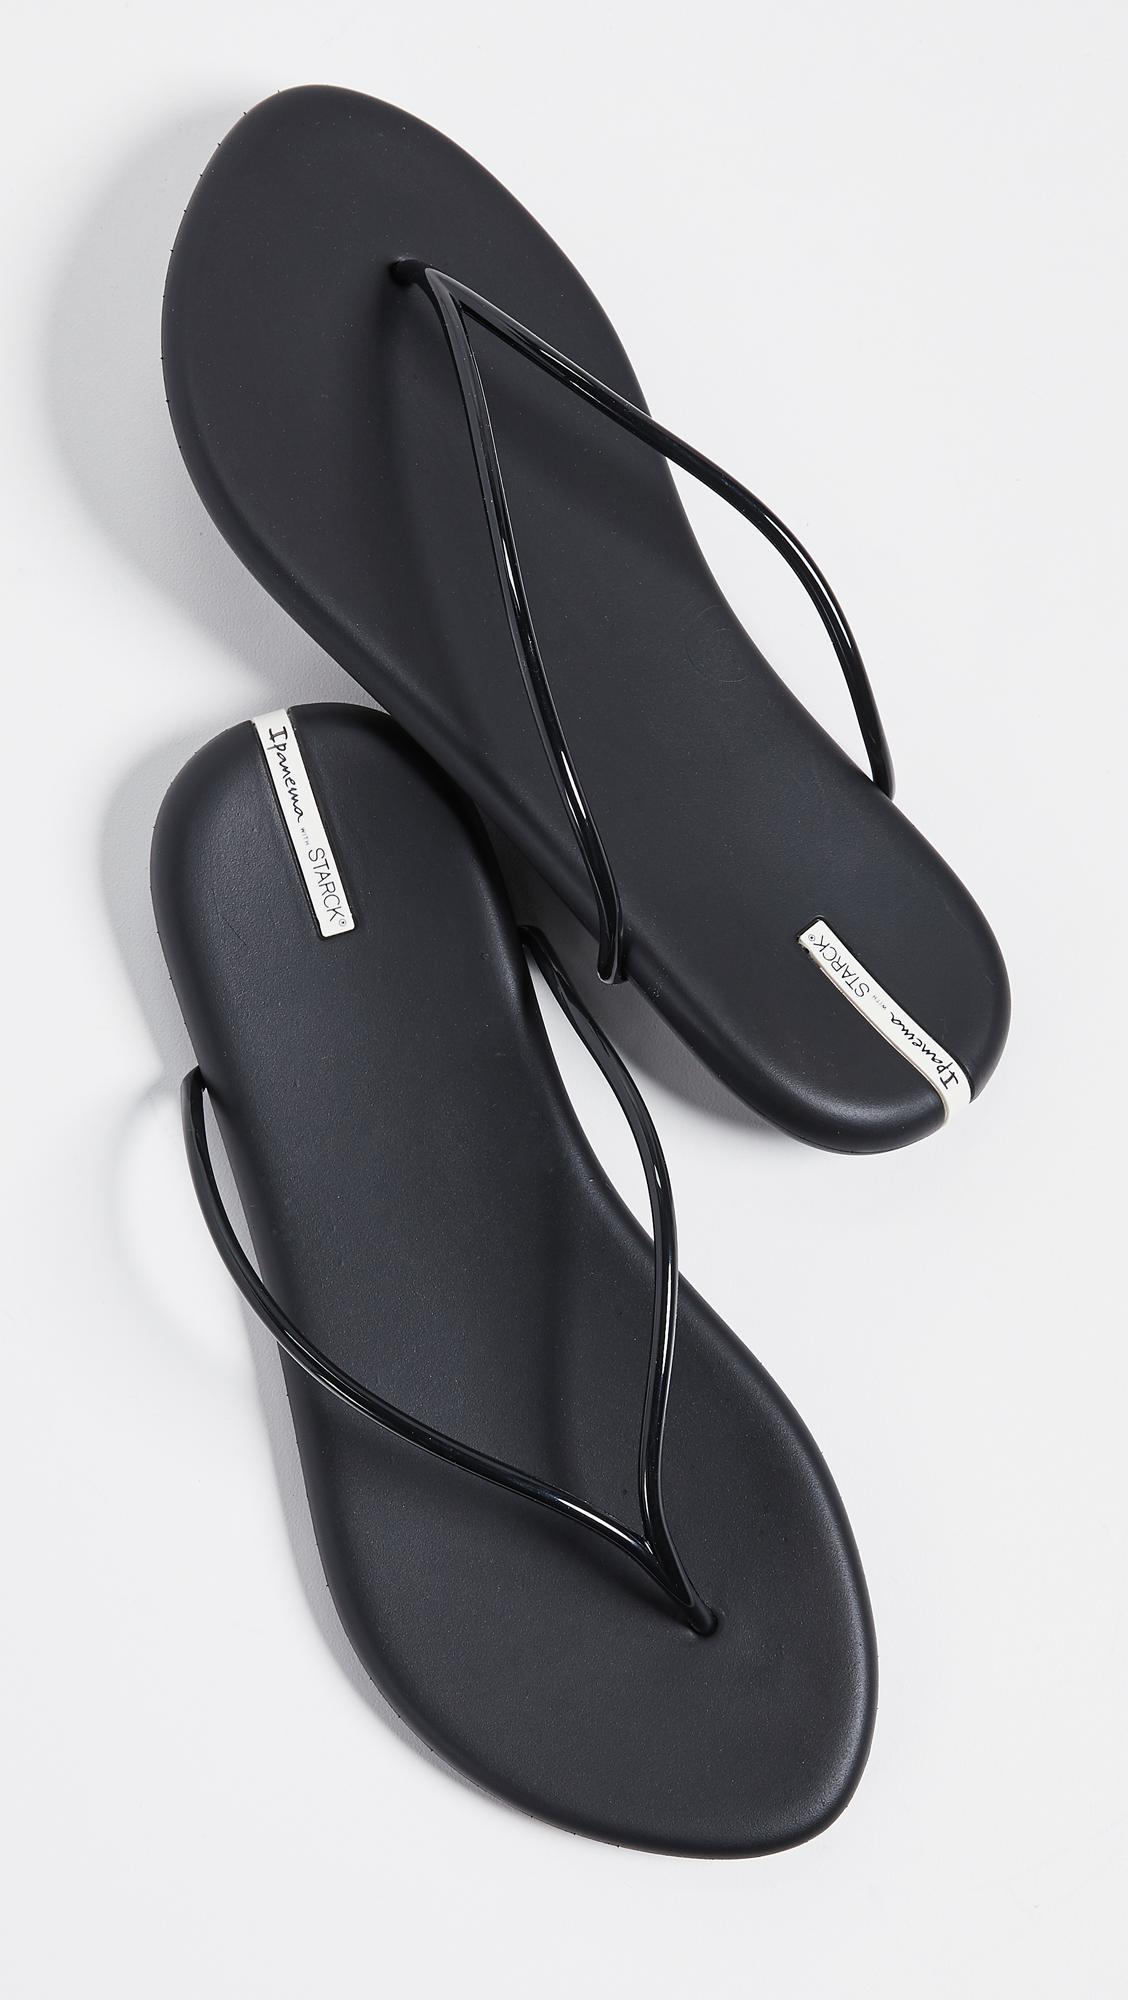 c9b3549674d Ipanema Philippe Starck Thing M Ii Flip Flops in Black - Lyst